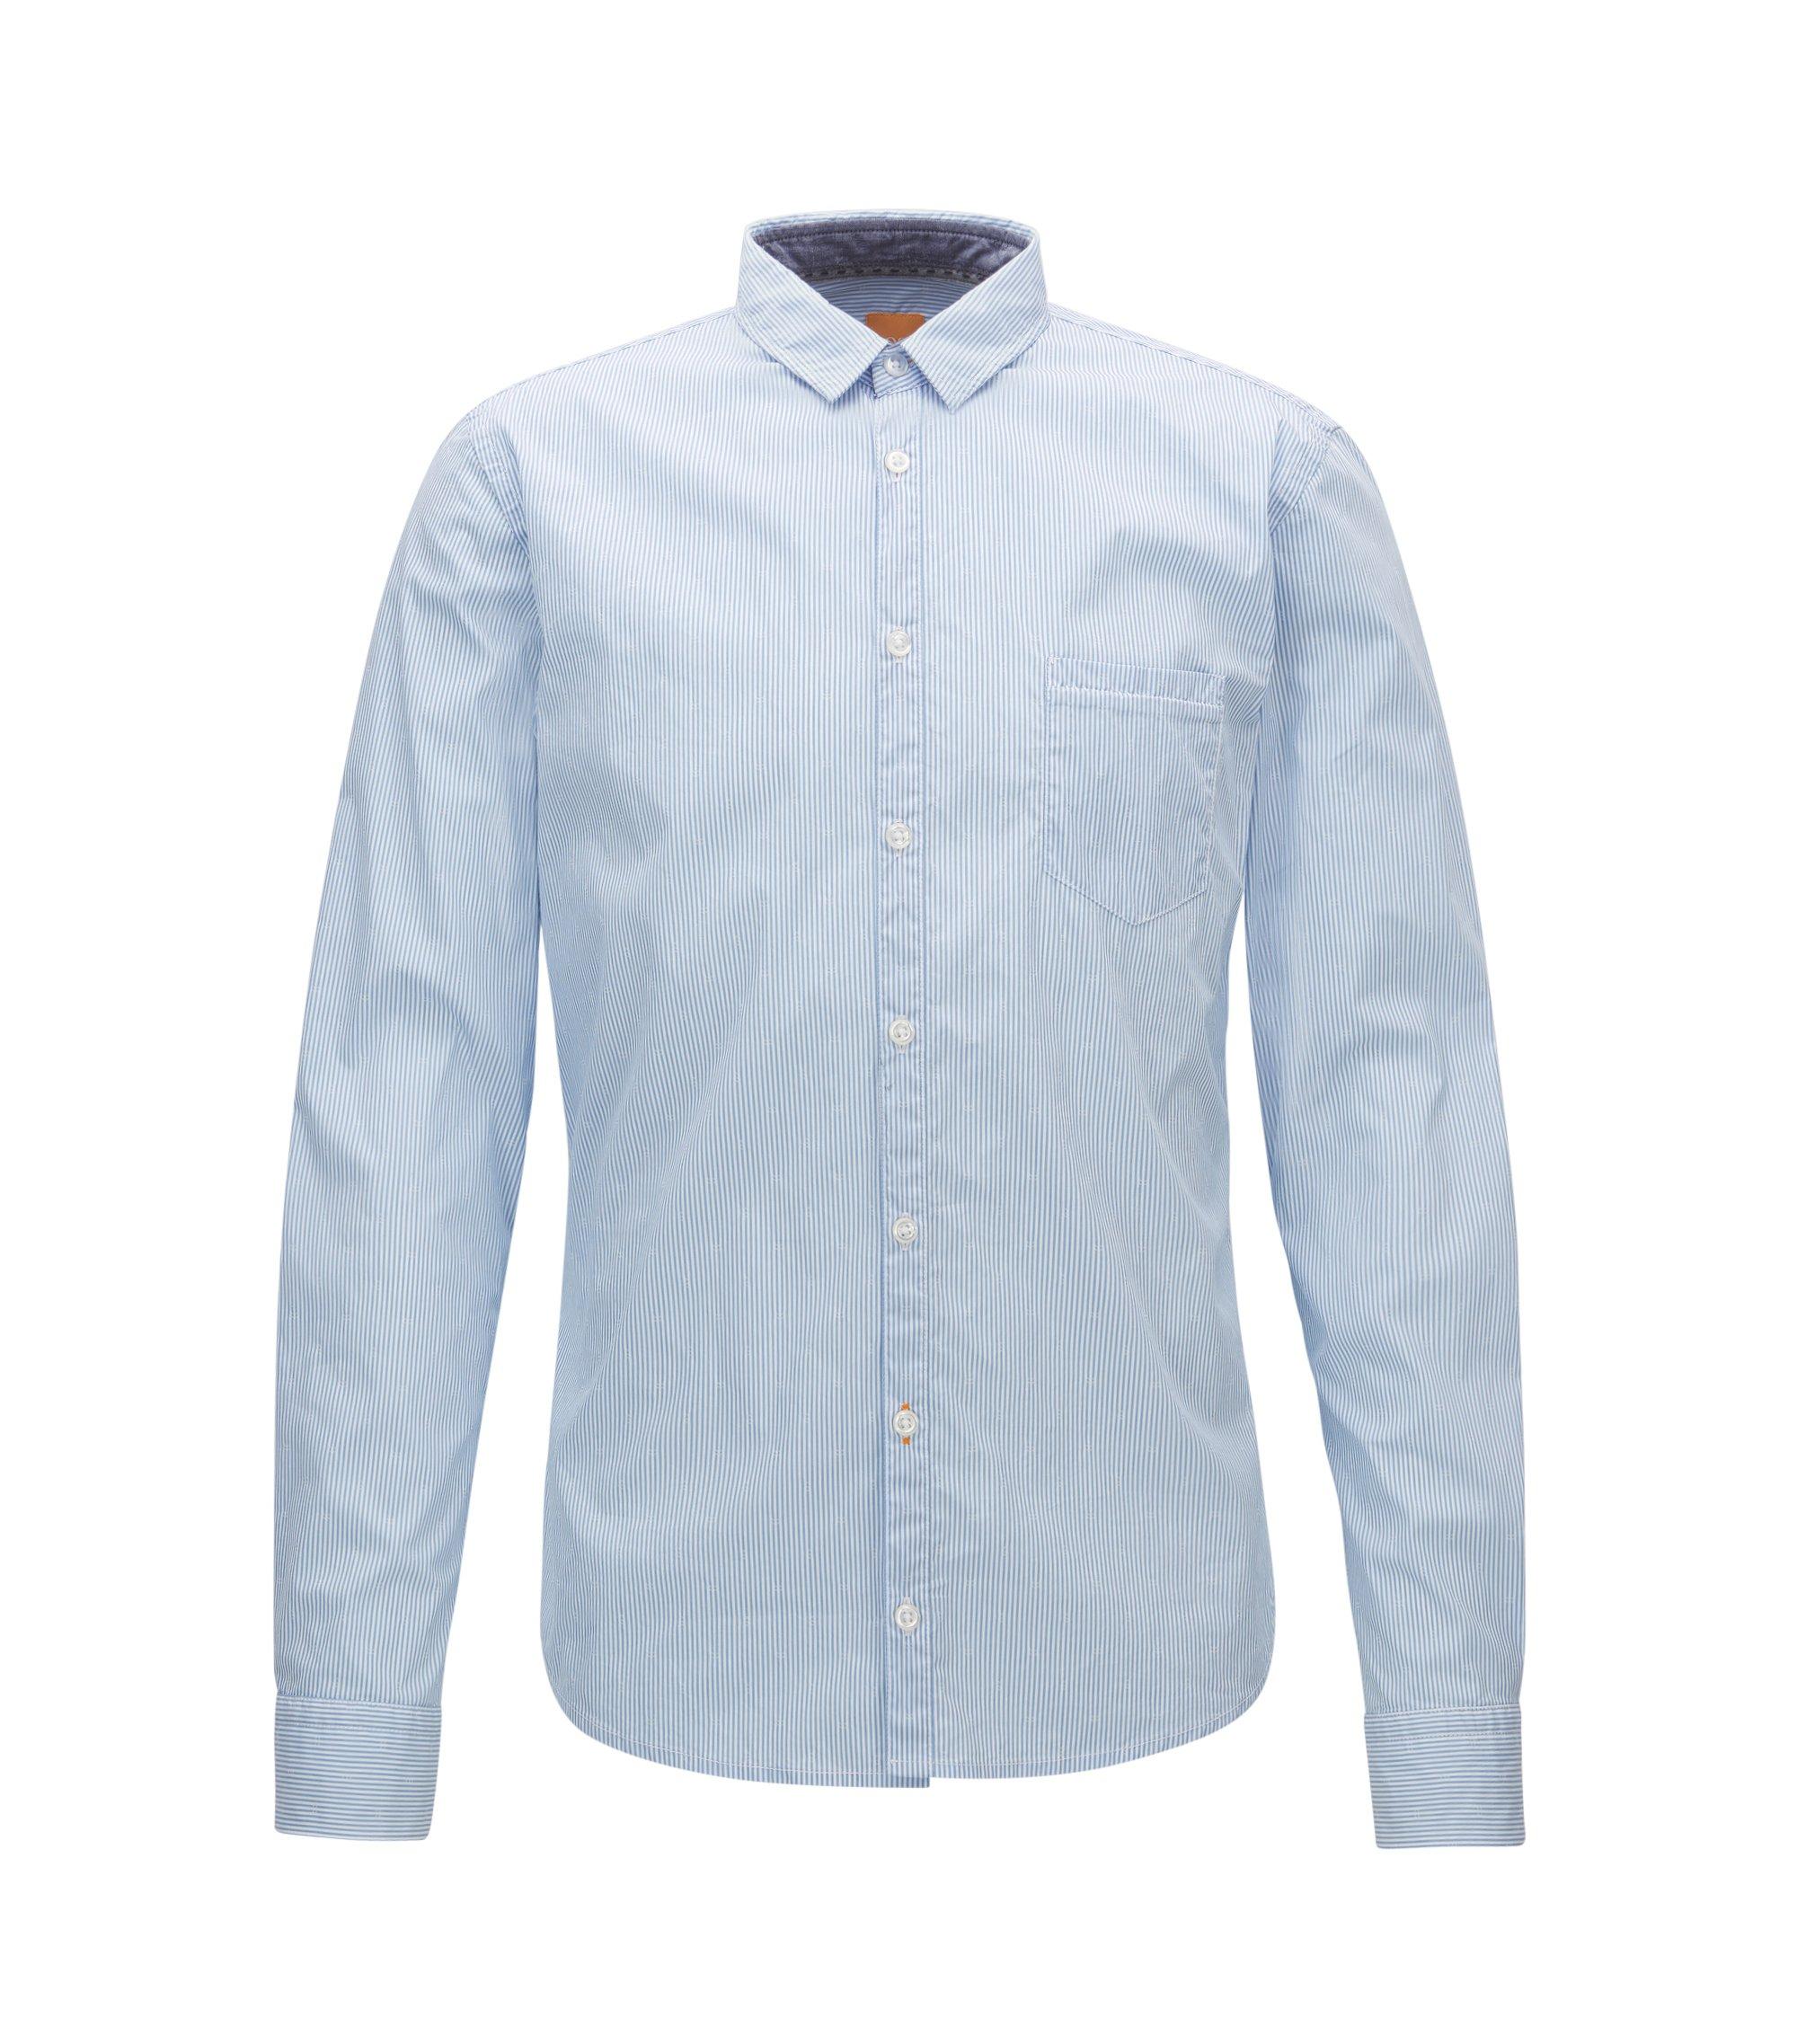 Striped Stretch Cotton Button Down Shirt, Extra Slim Fit | Eglam, Open Blue